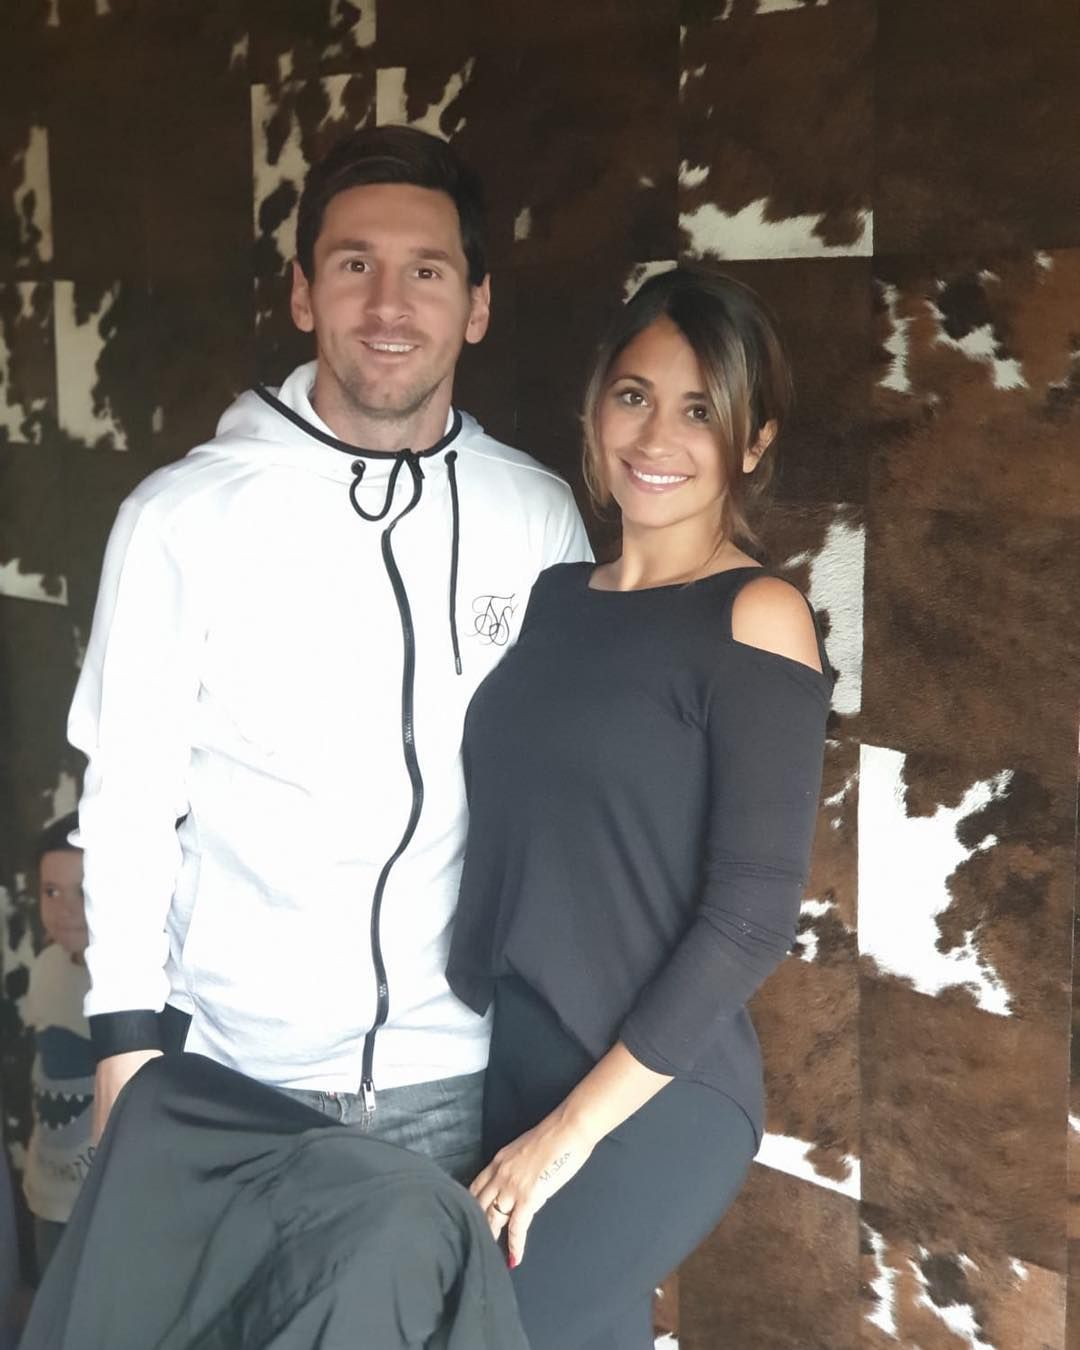 Lionelmessi Leomessi Argentine Familiartime October 2018 Instagram Com Lionel Messi Lionel Messi Wife Messi And Wife